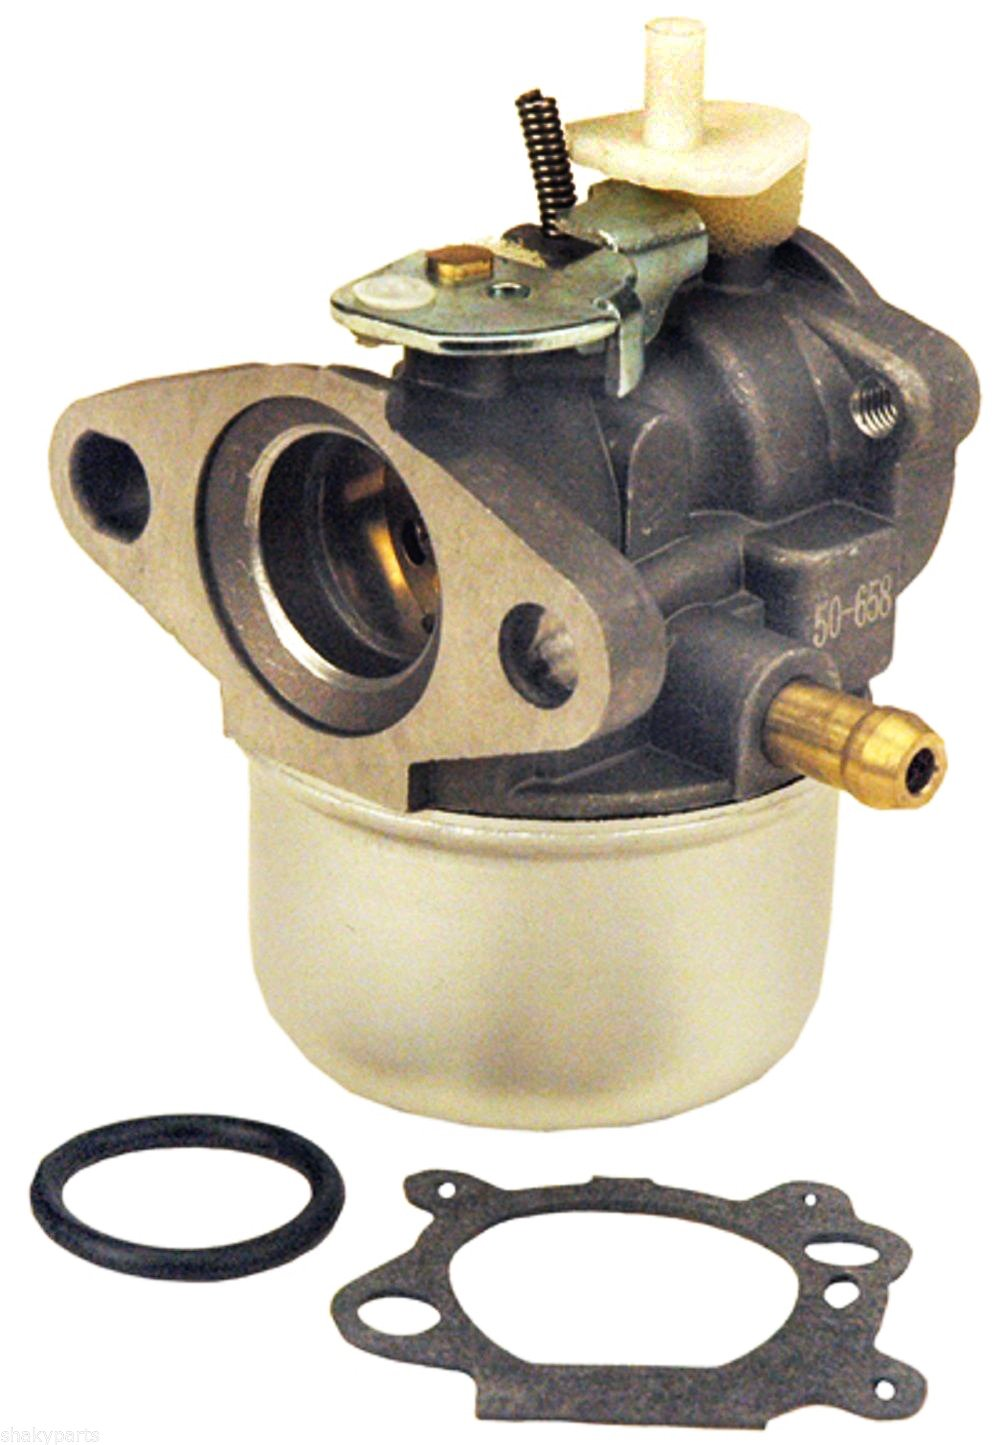 Briggs /& Stratton 499059 Carburetor 120000 Model Series 14112 Rotary with Choke fits 12F702 12H812 12H802